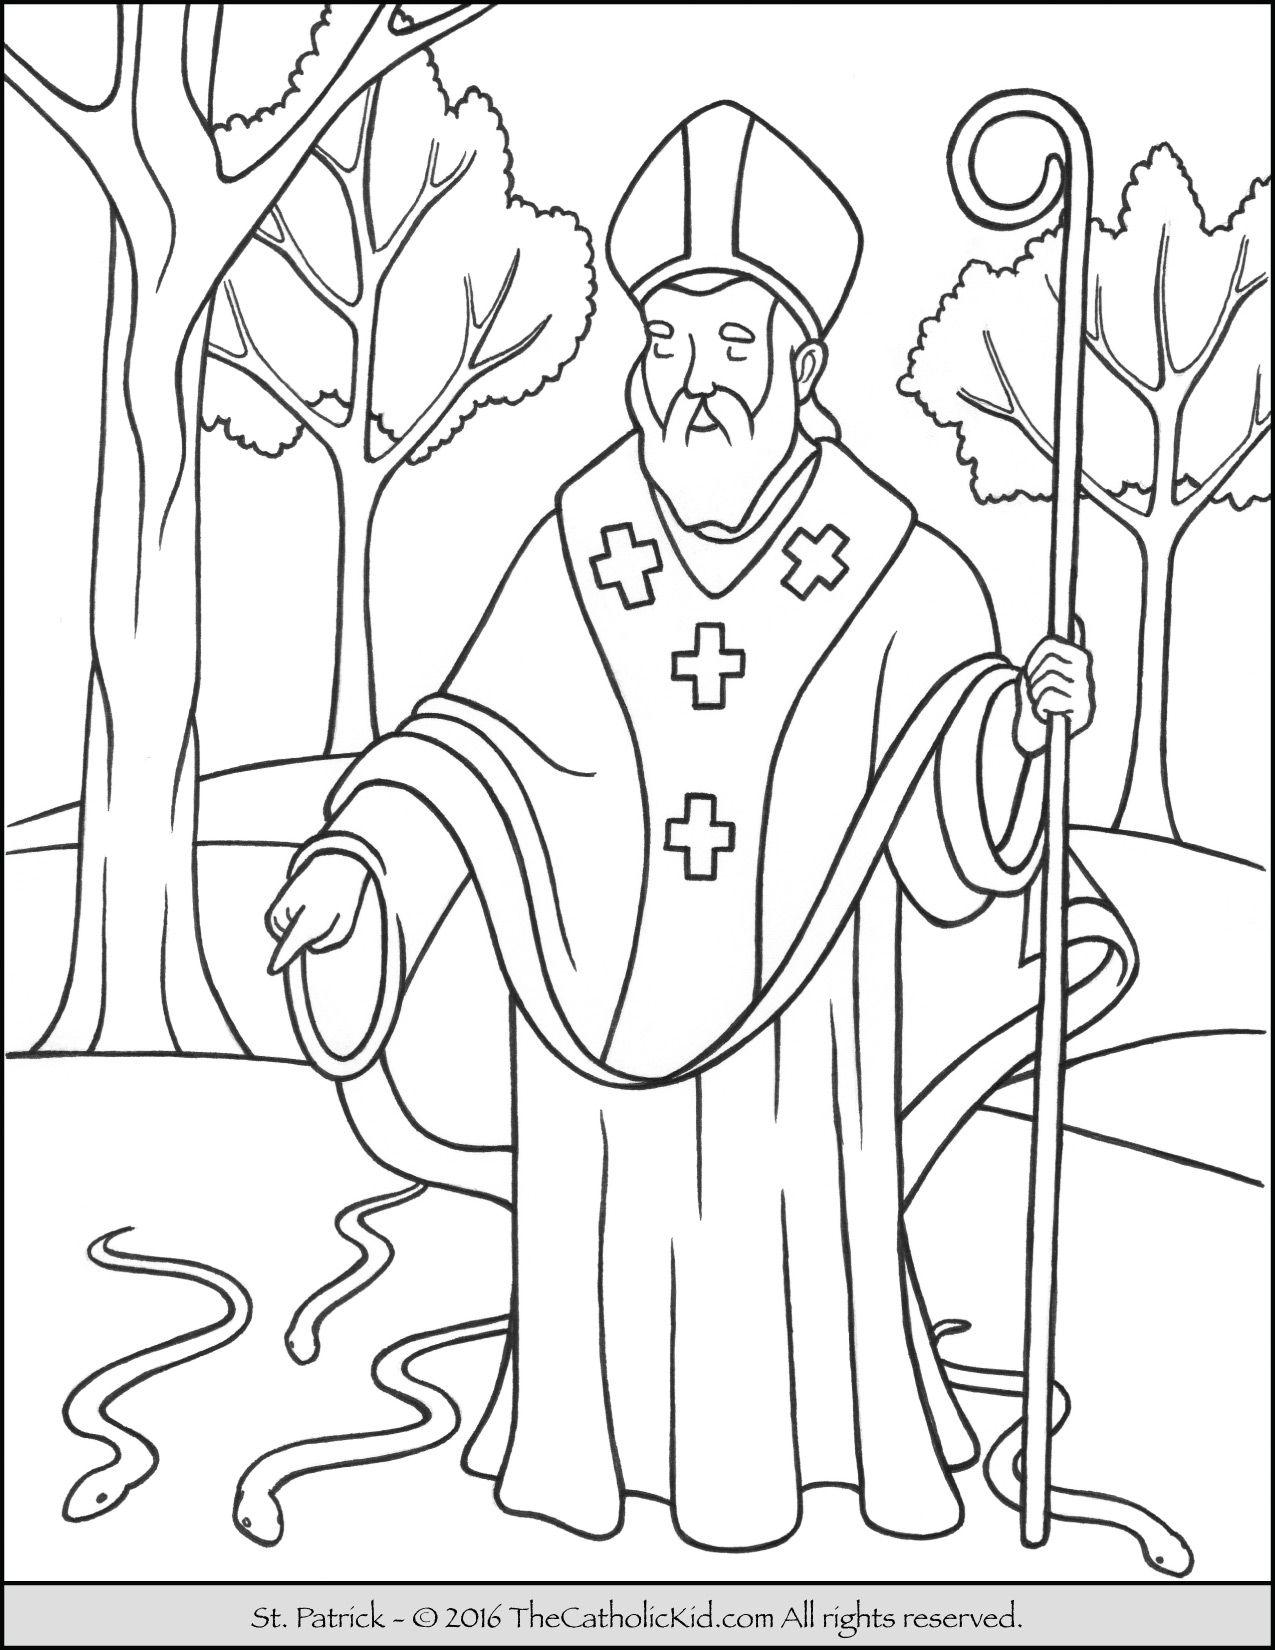 Saint Patrick Coloring Page The Catholic Kid Catholic Coloring Coloring Pages Saint Coloring